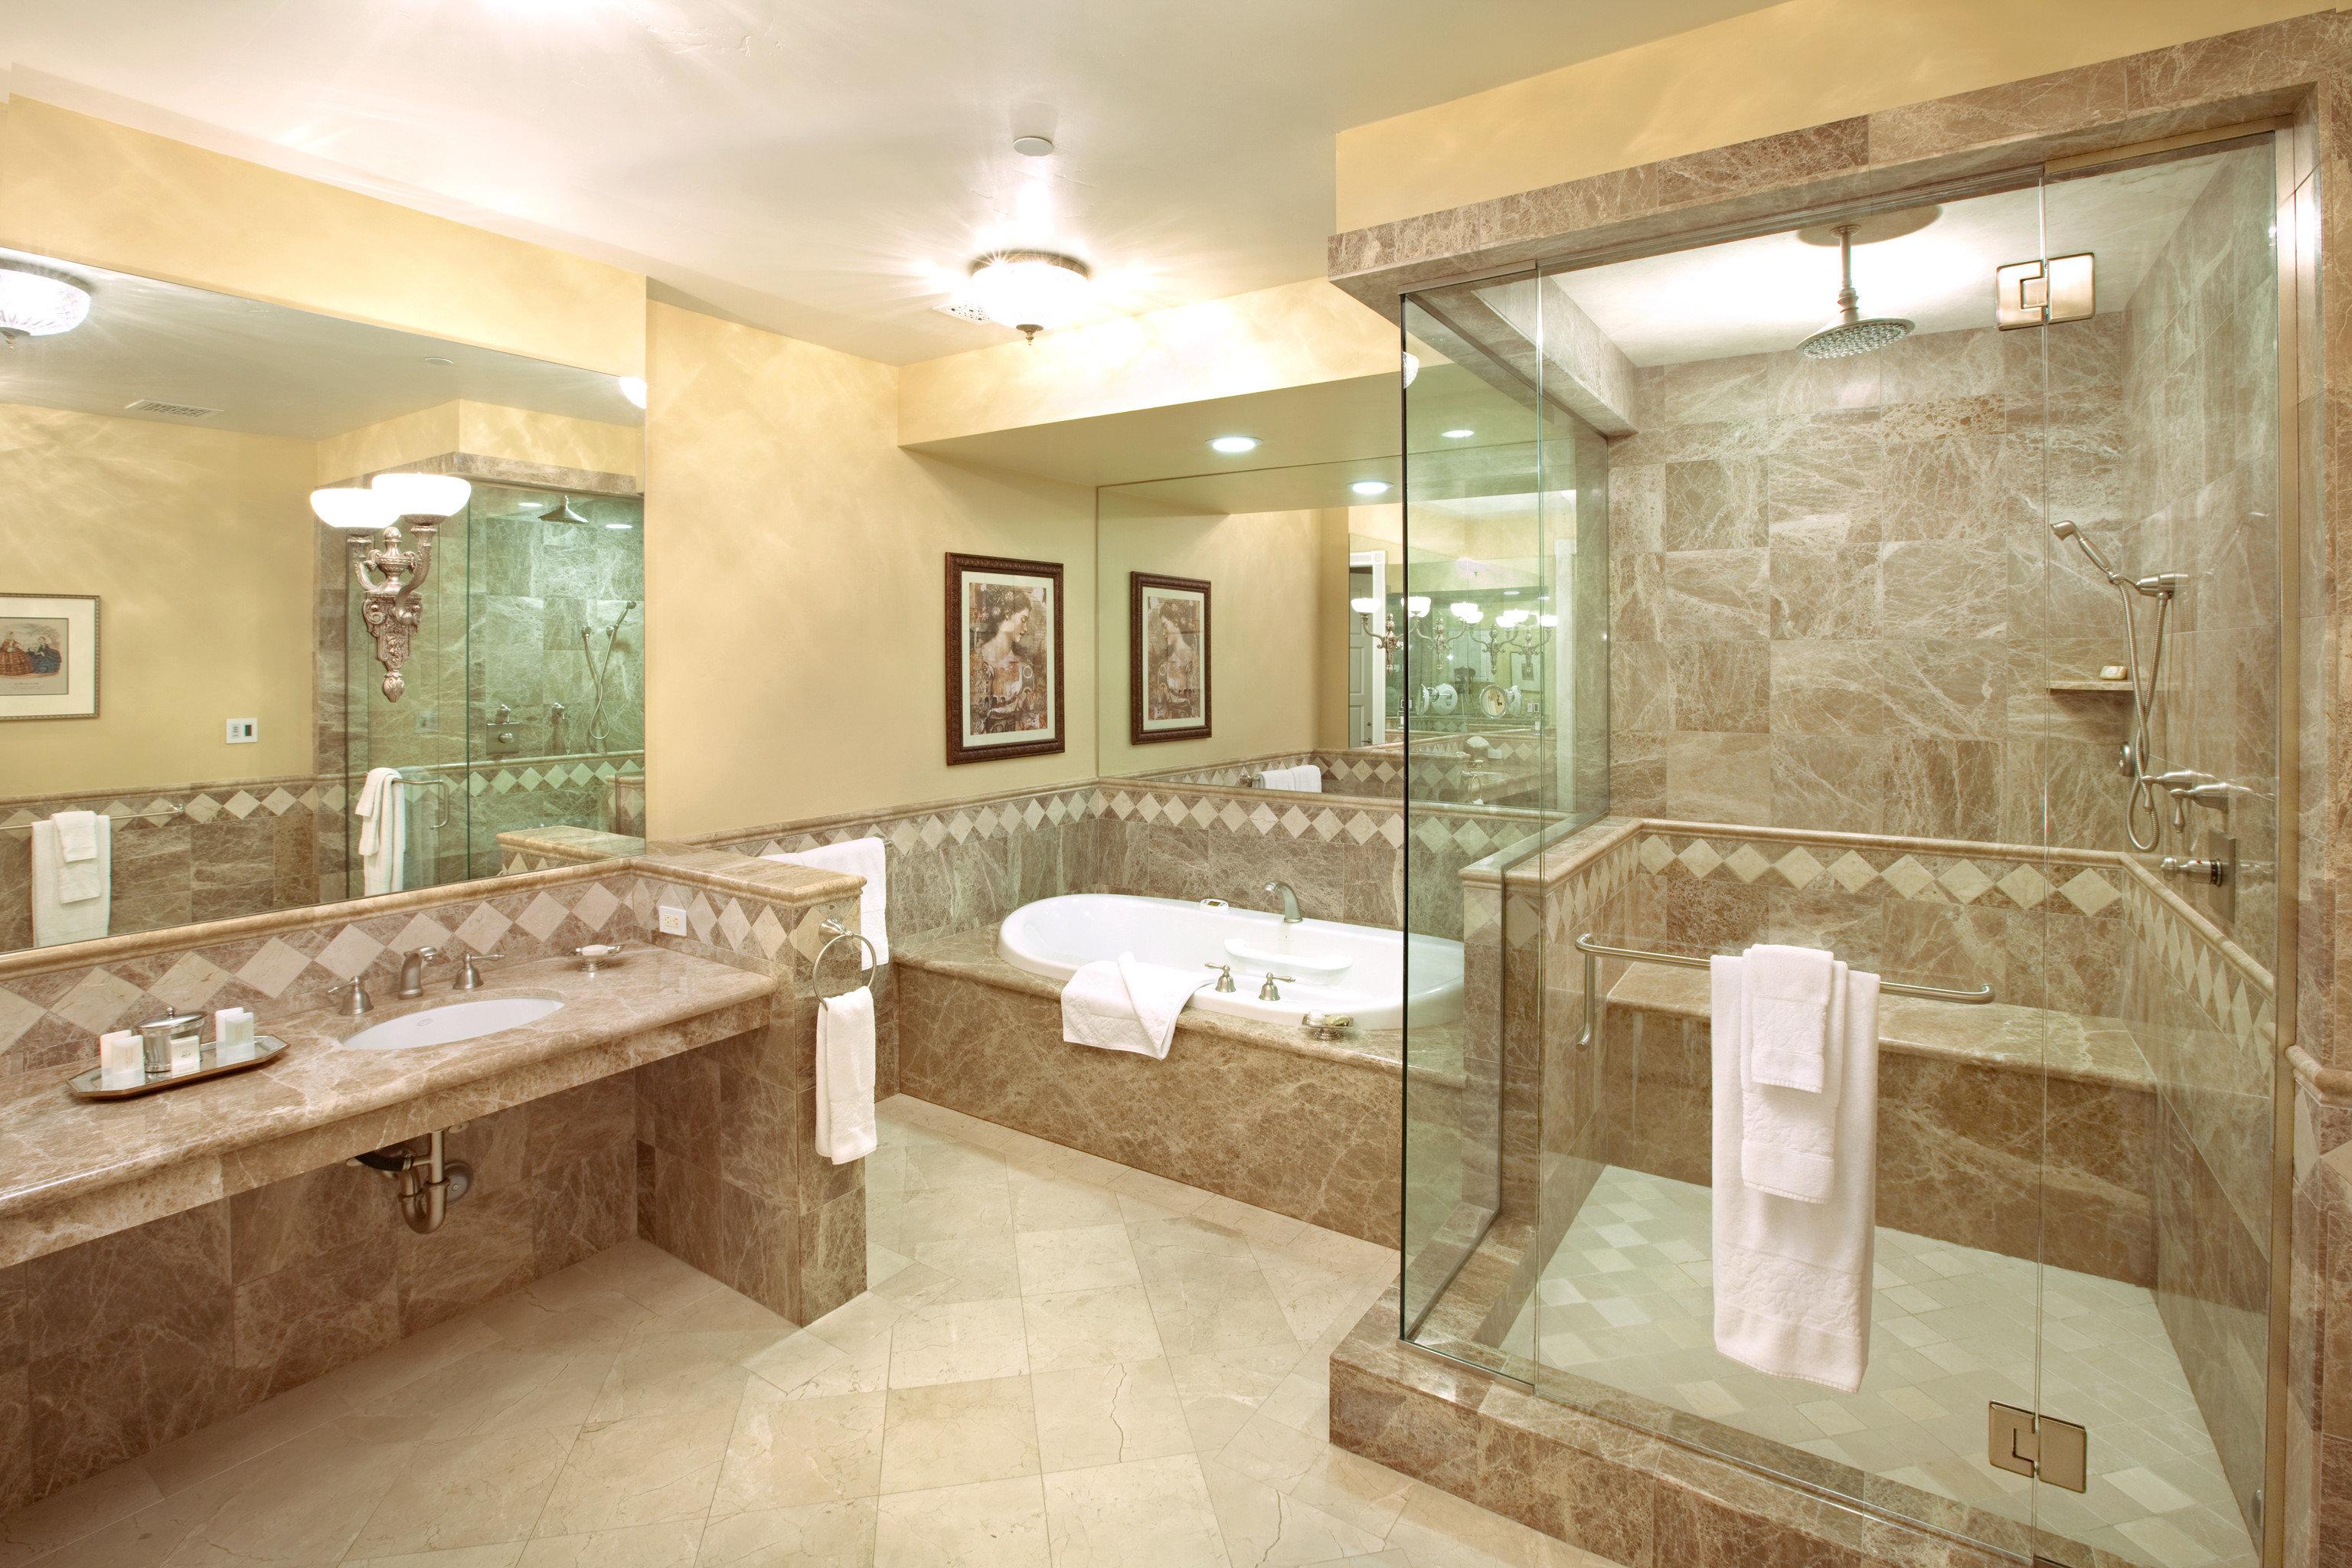 Bath Elegant Historic Inn Romantic bathroom property sink home flooring mansion plumbing fixture tub stone bathtub tile tiled tan